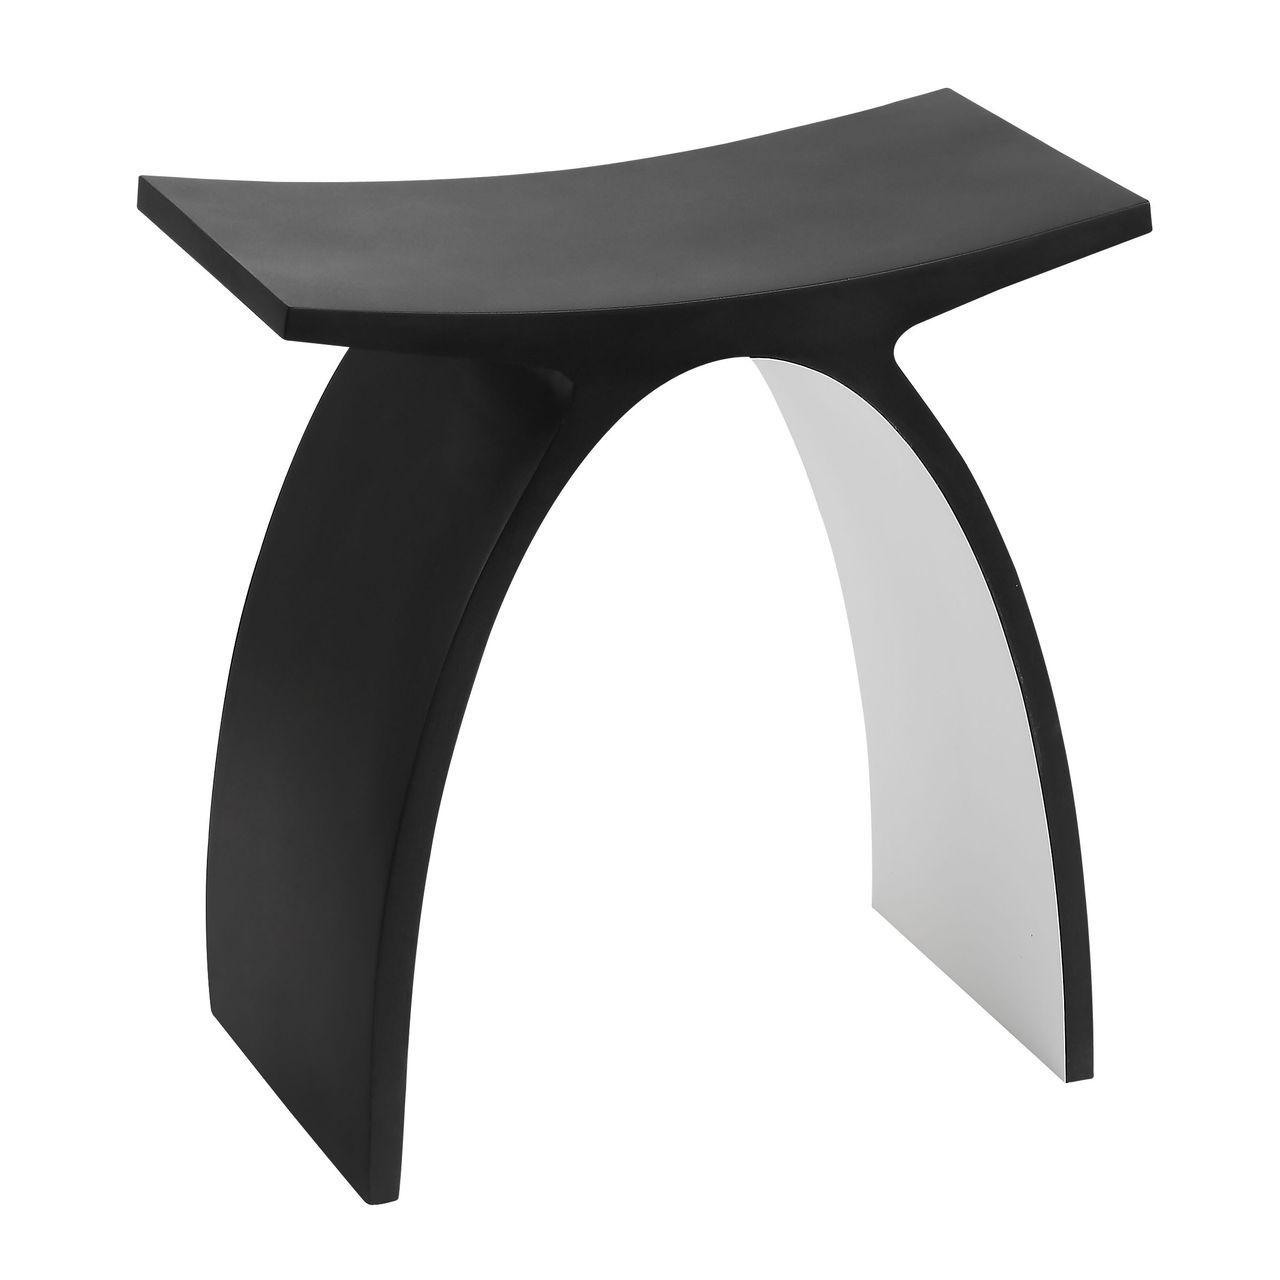 ALFI Black Matte Arched Solid Surface Resin Bathroom / Shower Stool